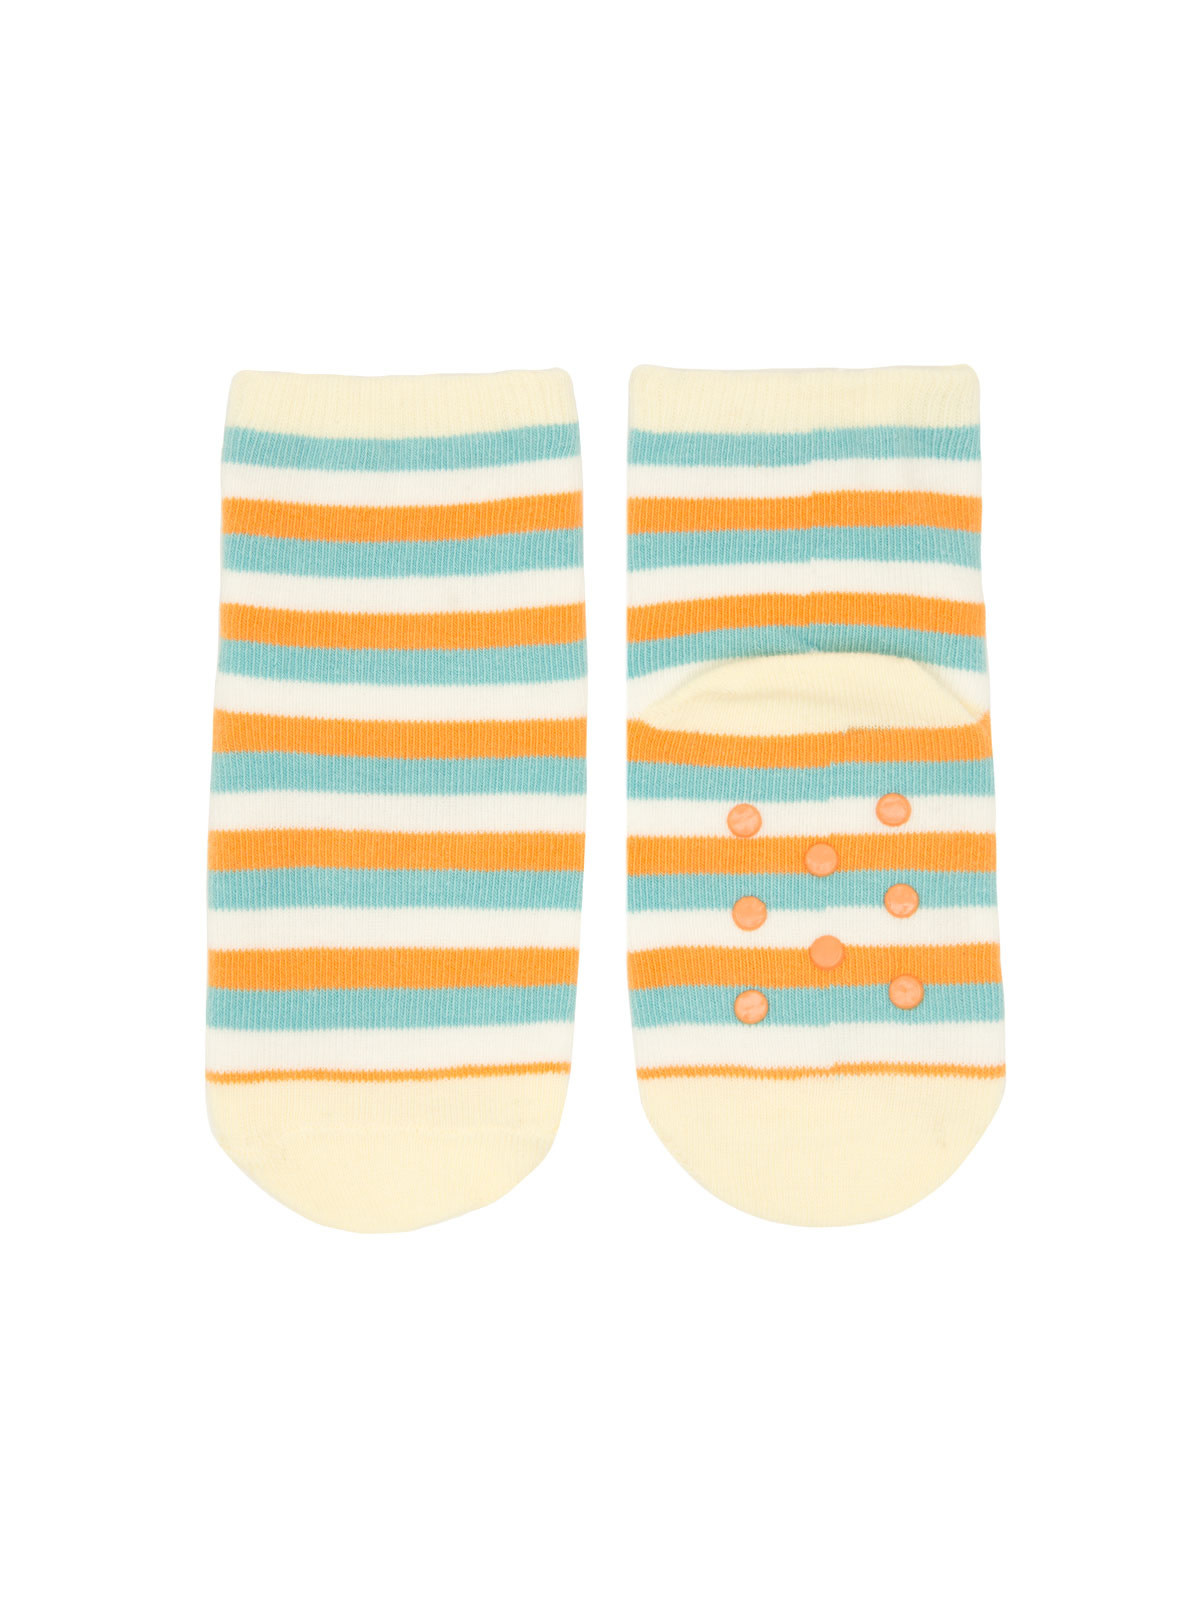 Mo Willems Kids Socks